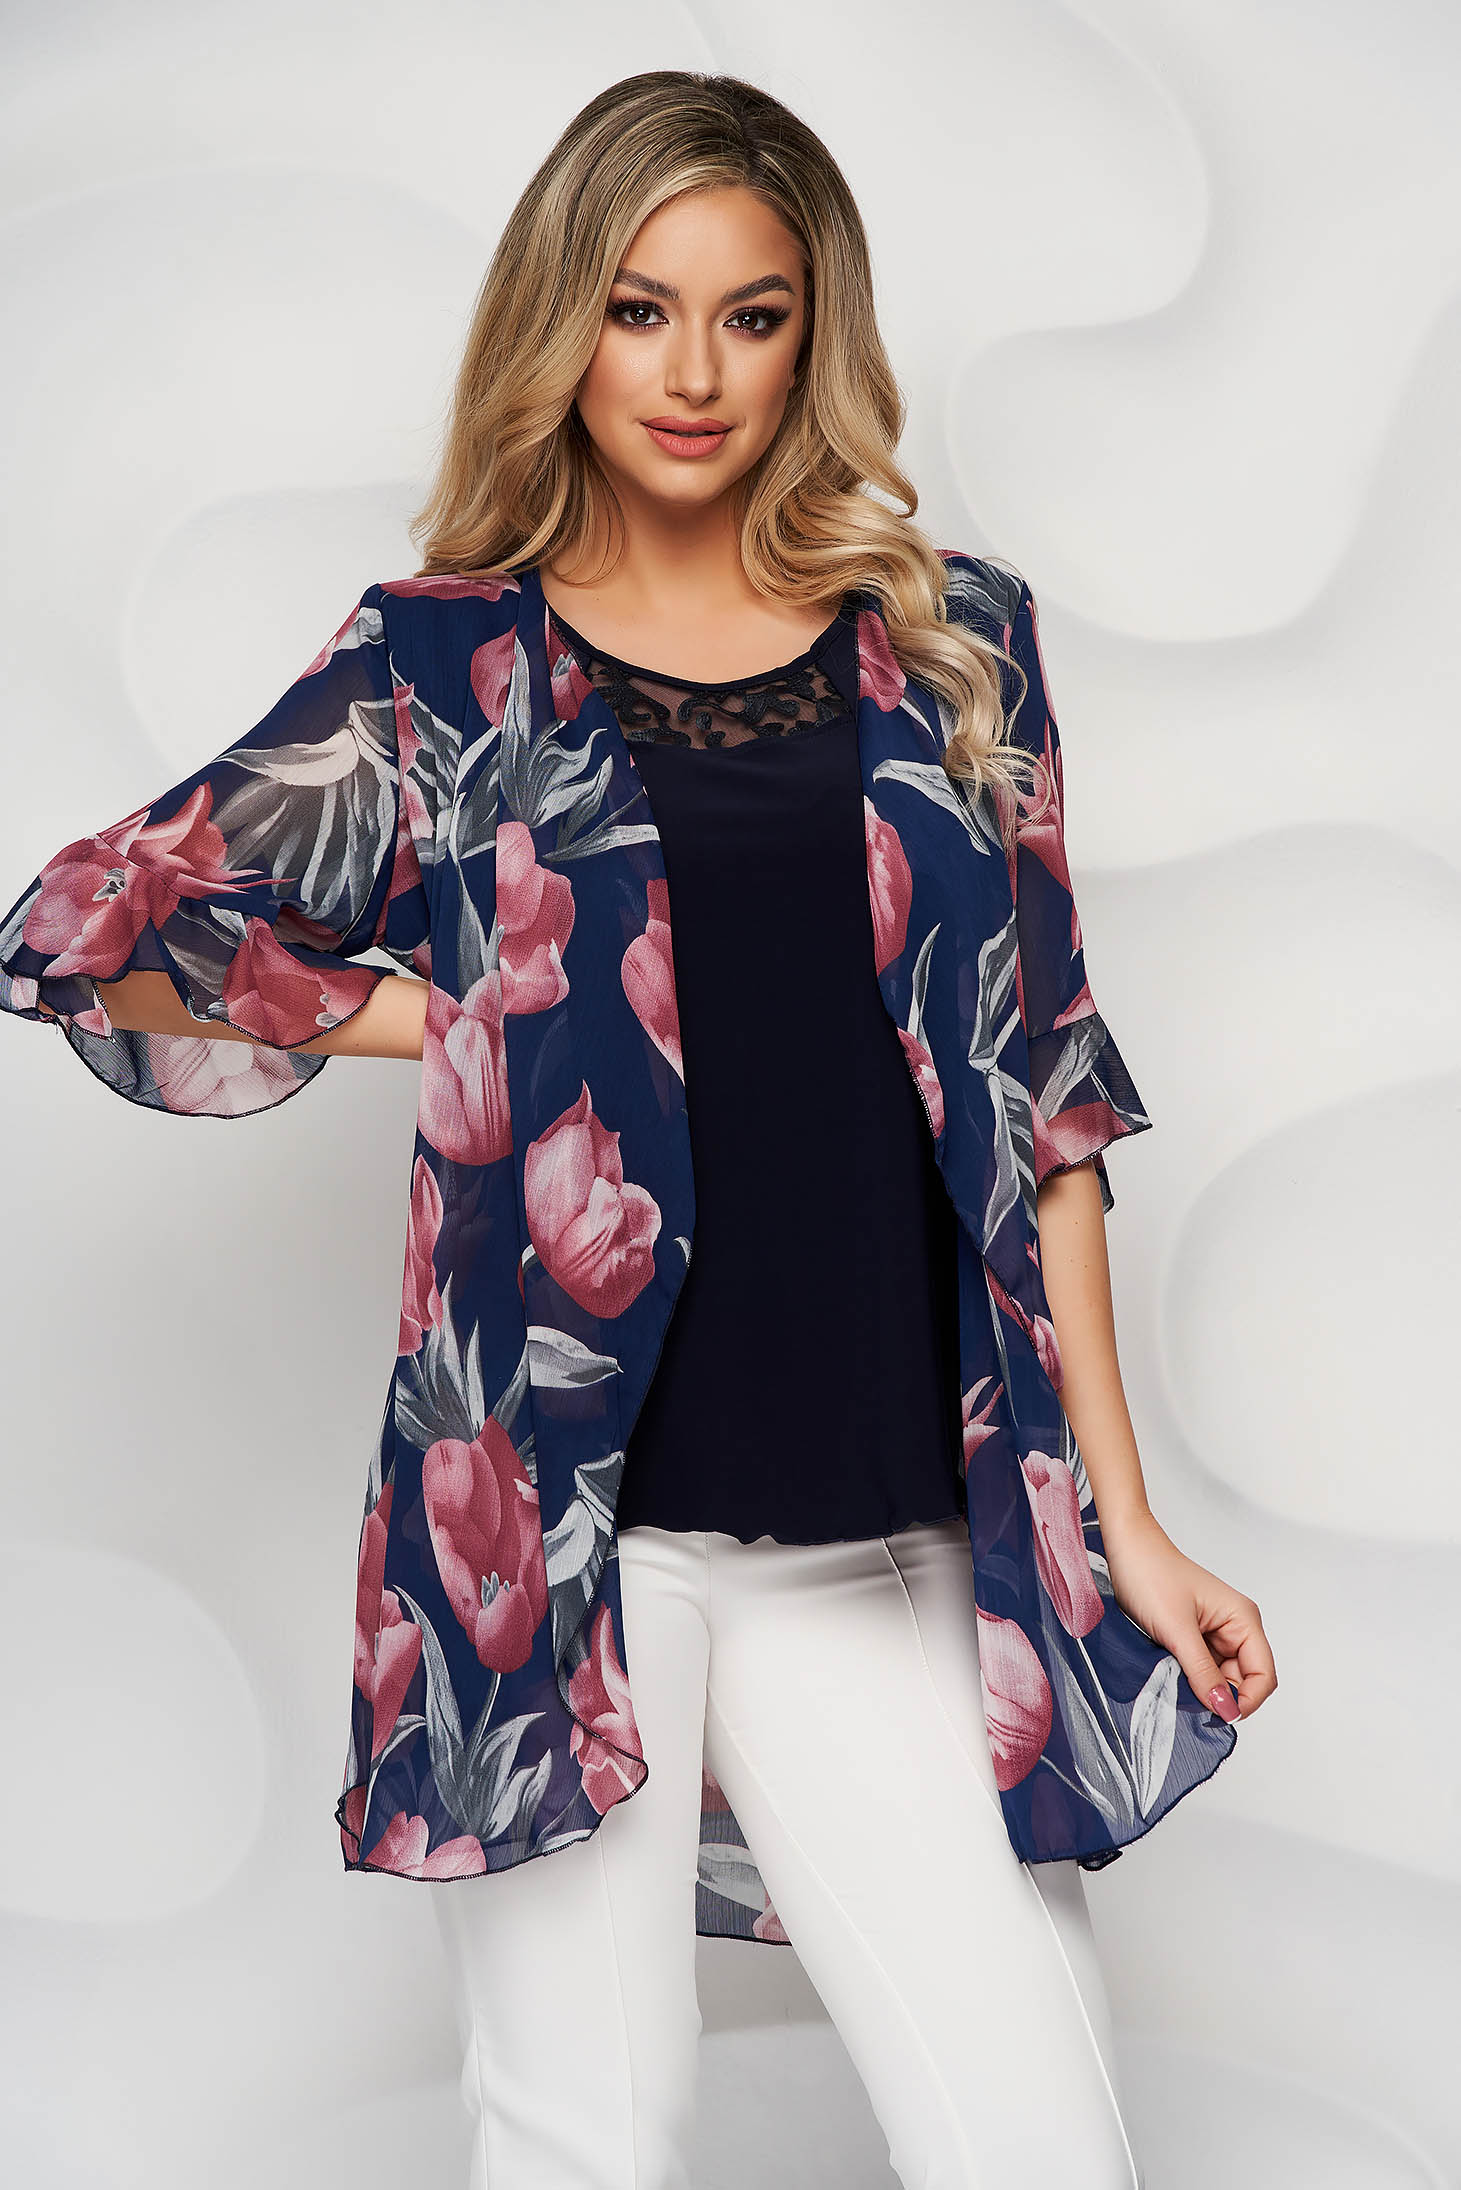 Bluza dama Lady Pandora cu suprapunere tip camasa albastru-inchis cu imprimeu floral cu dantela